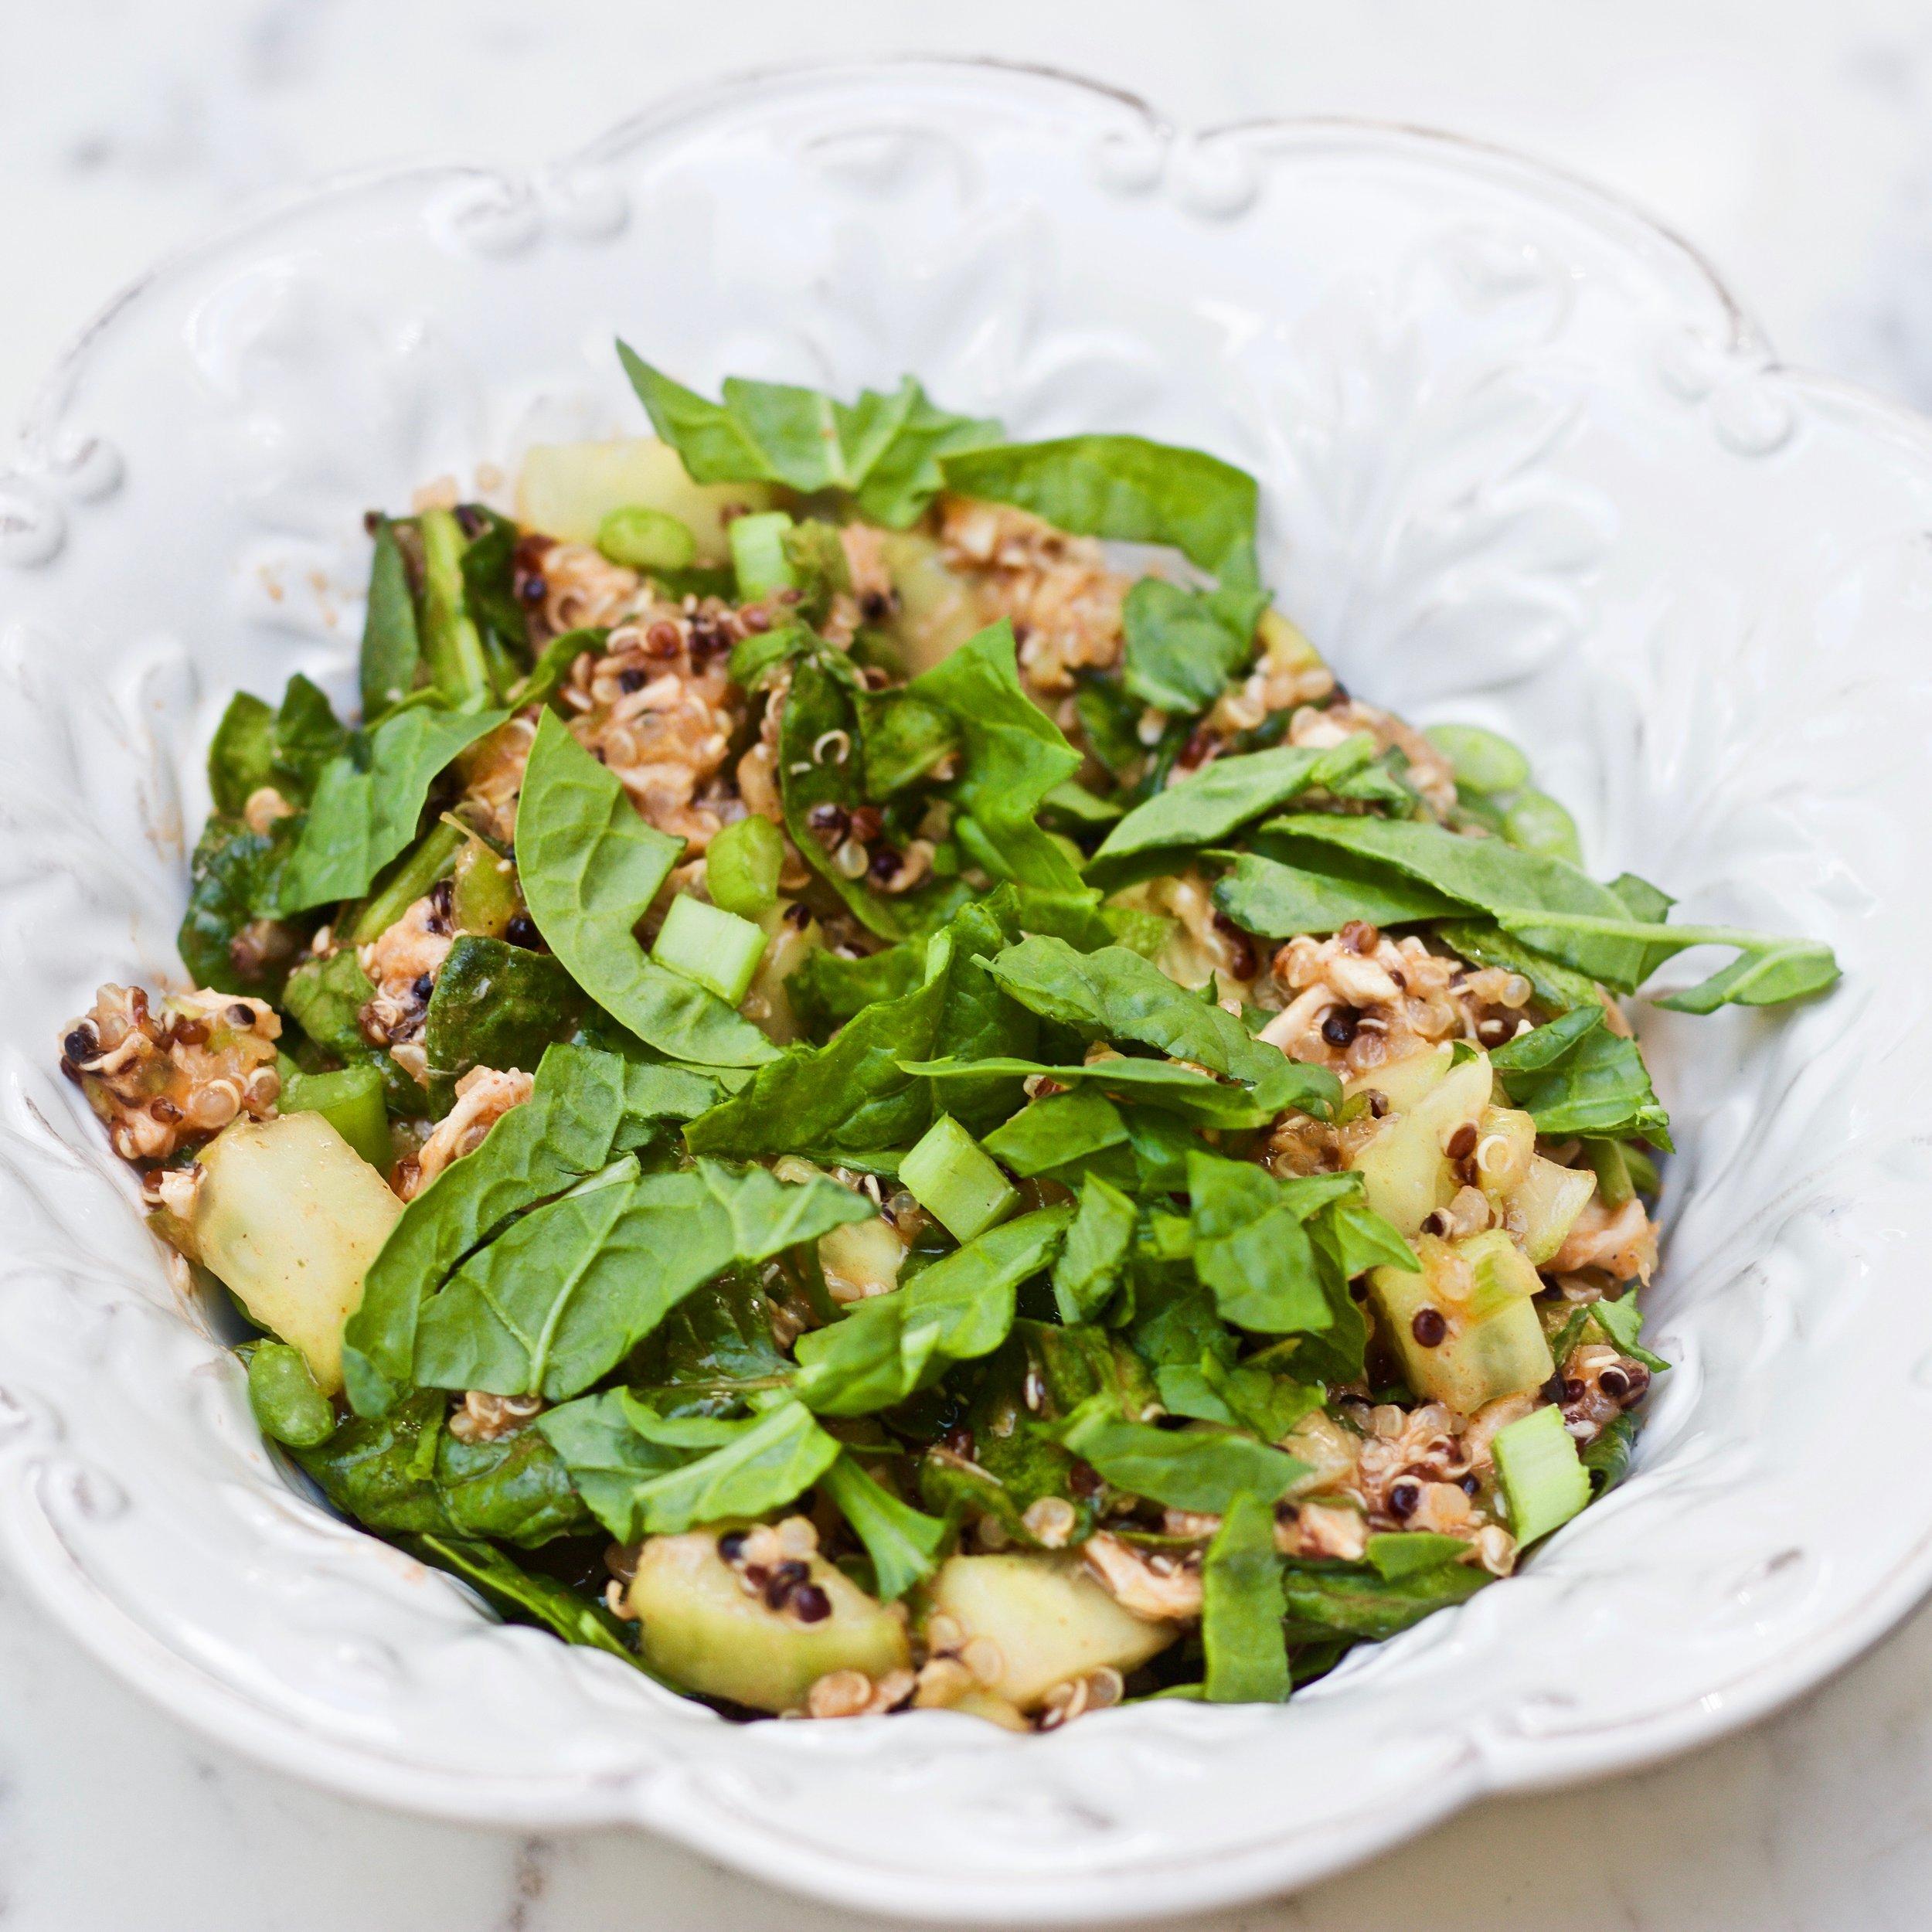 Check out our recipe for Quinoa Buffalo Chicken Protein Bowl - Printable recipe available